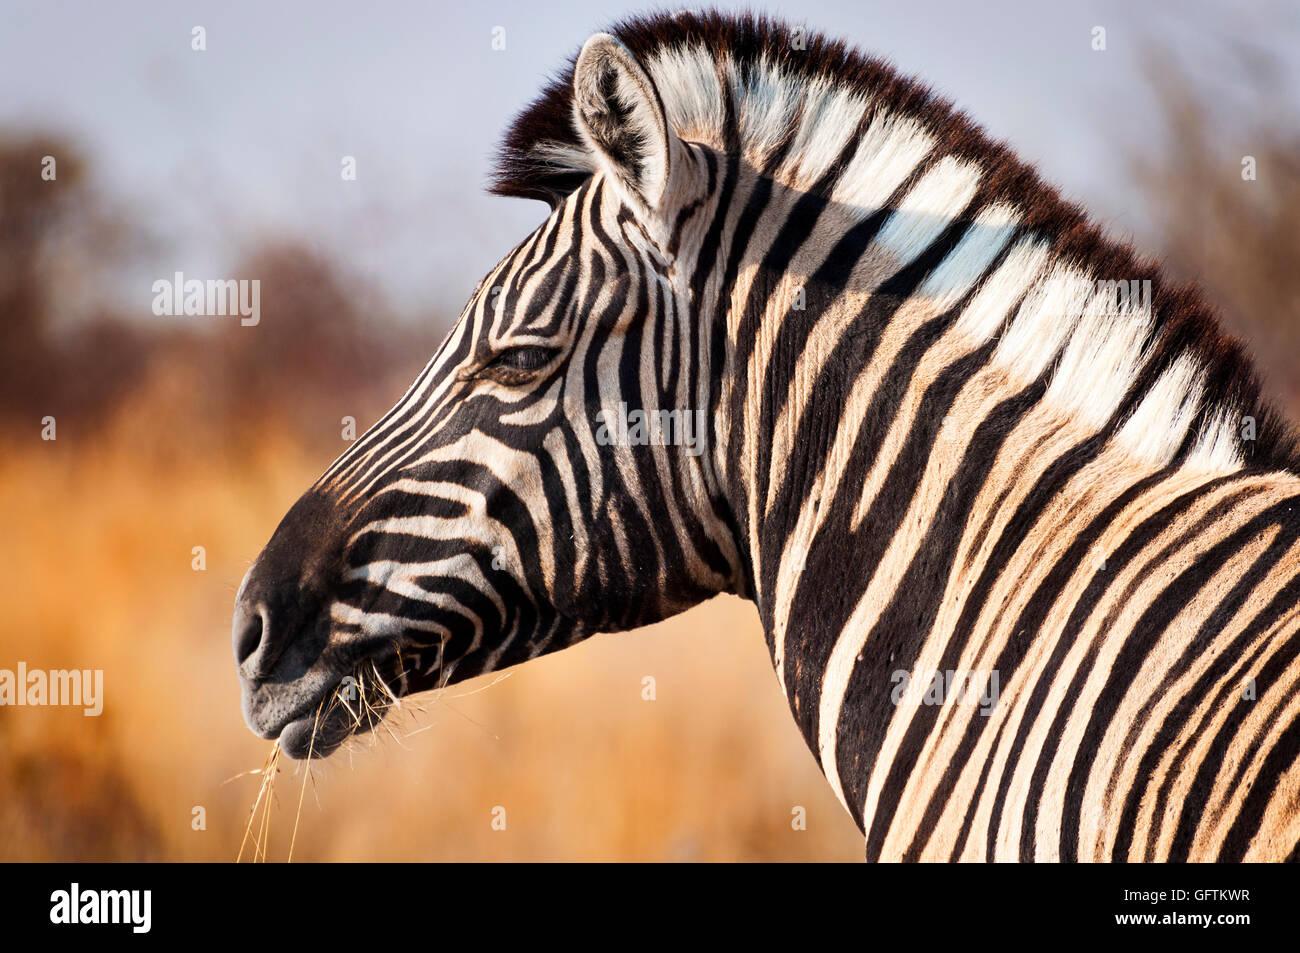 Kopf eines Zebras im Etosha Nationalpark in Namibia, Afrika-Konzept für das Reisen in Afrika Stockbild